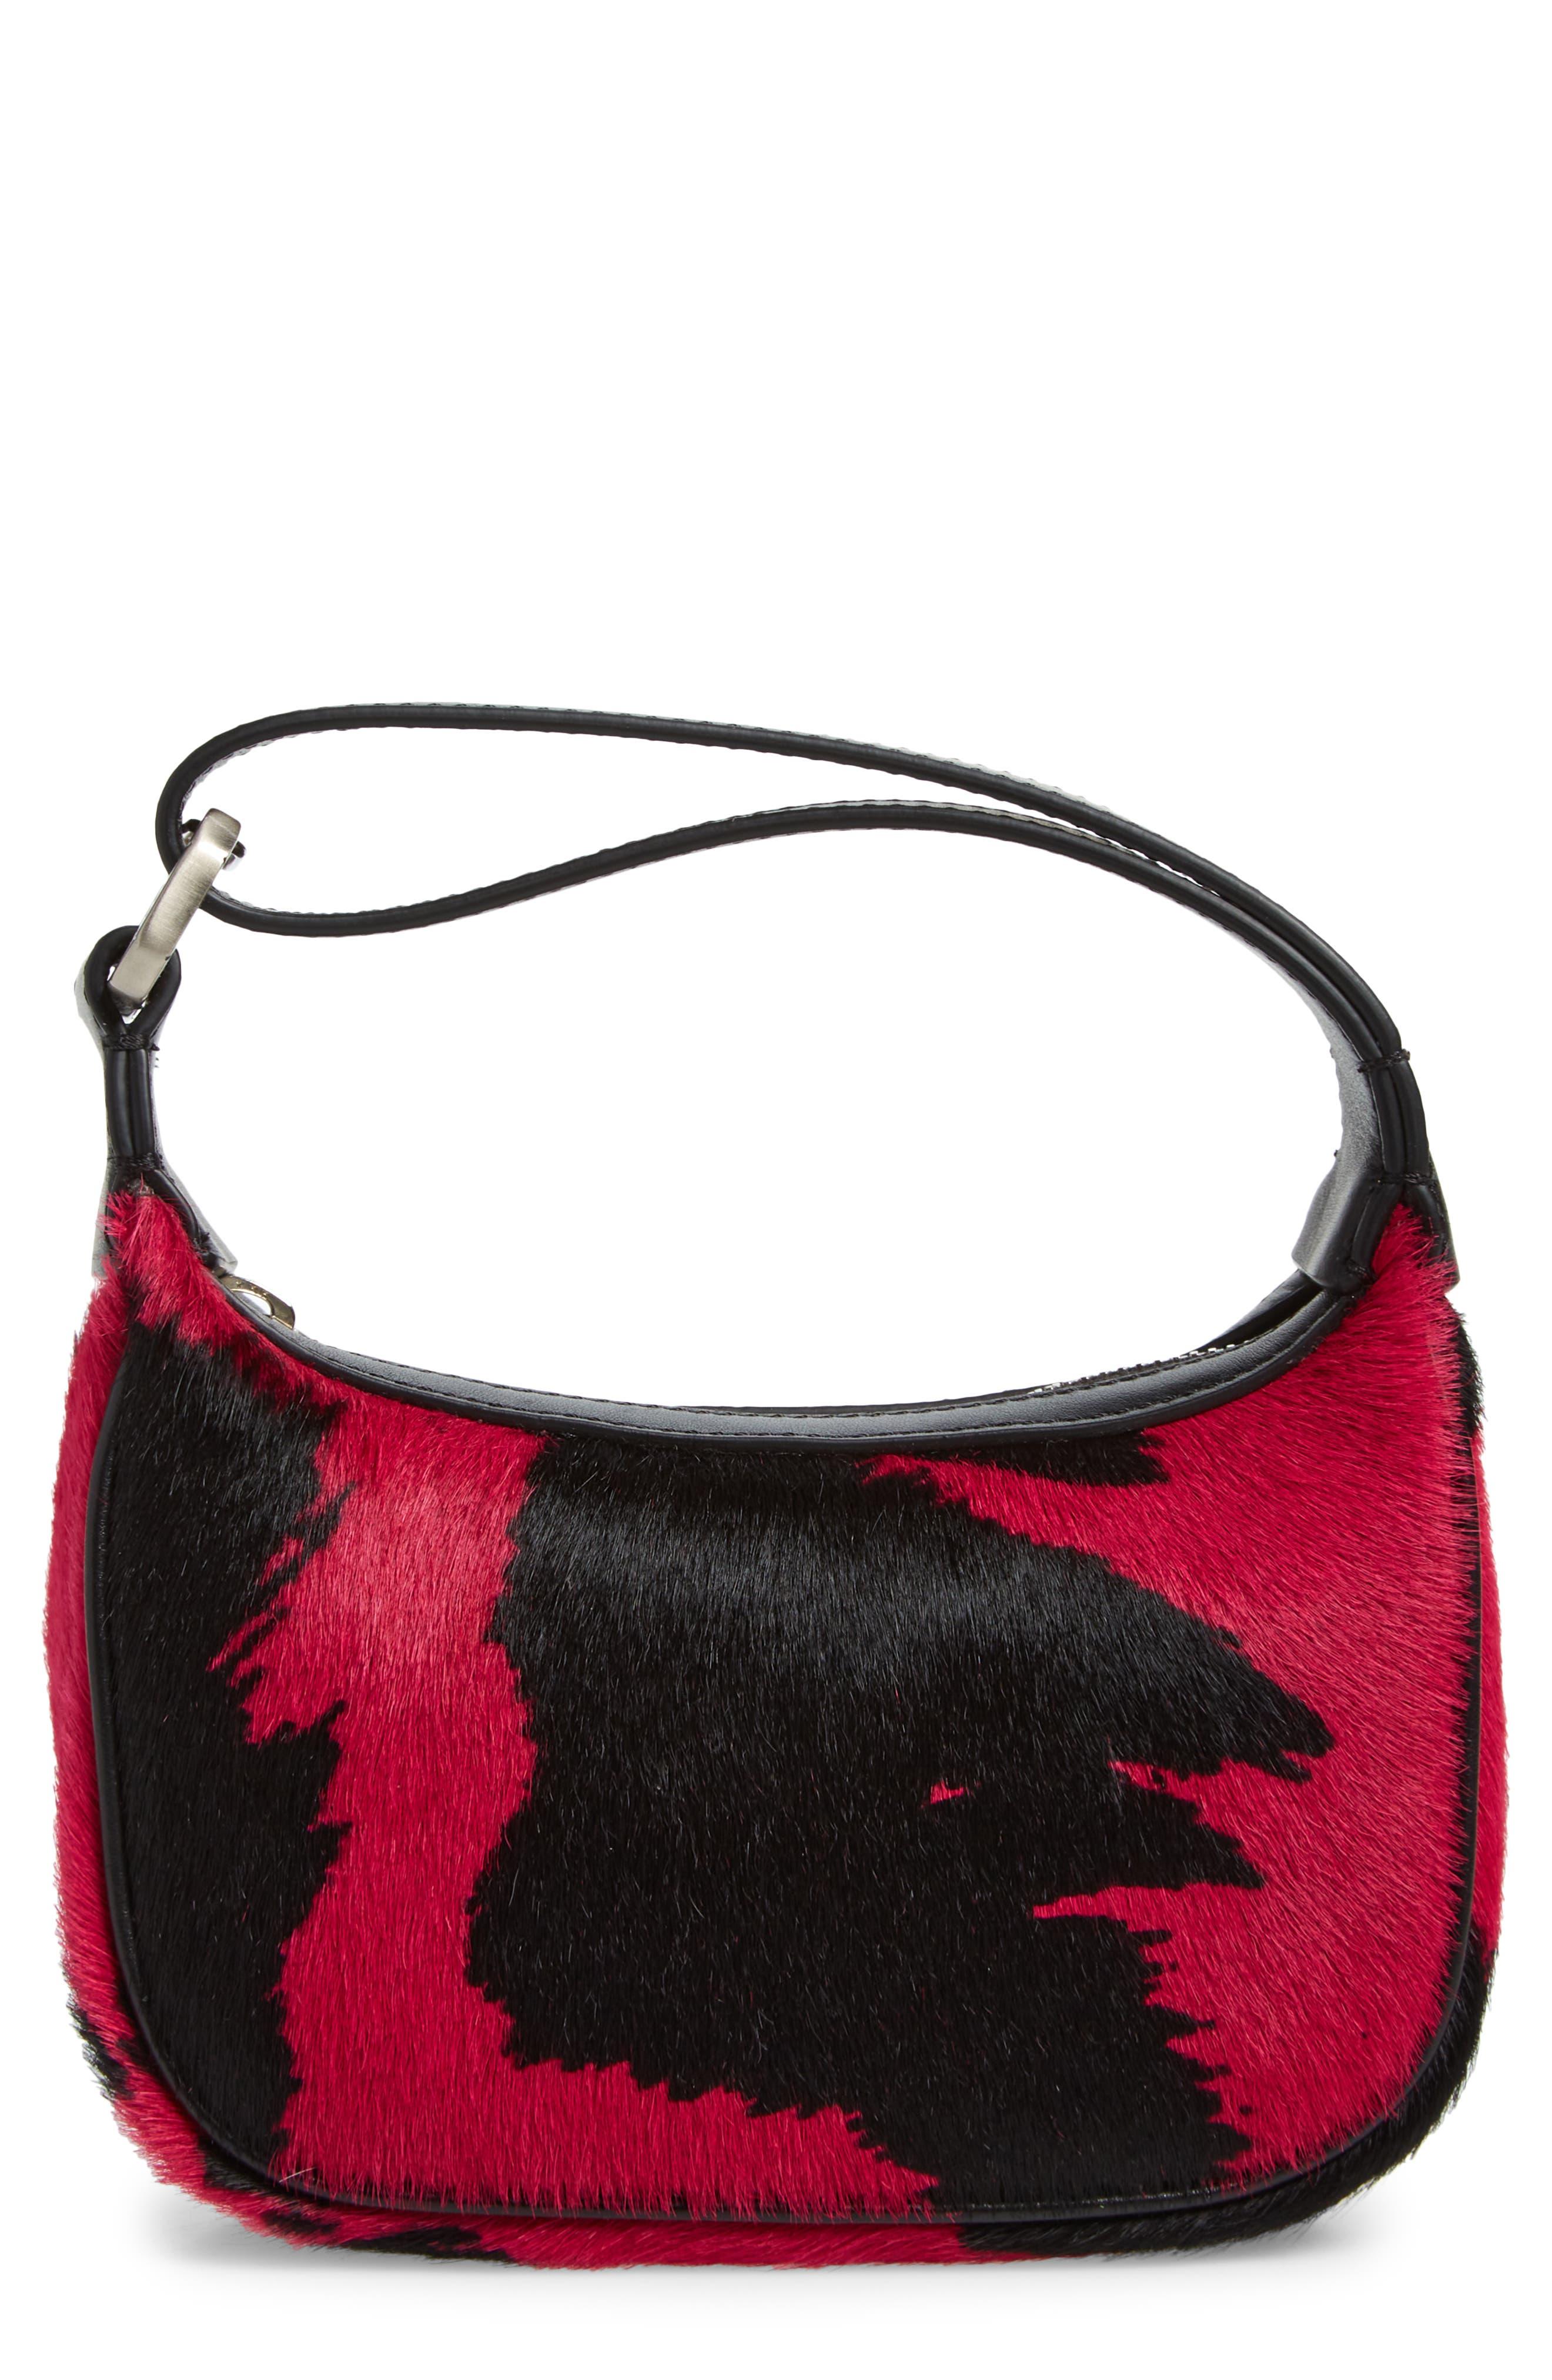 Eera Mini Moonbag Genuine Calf Hair Handbag